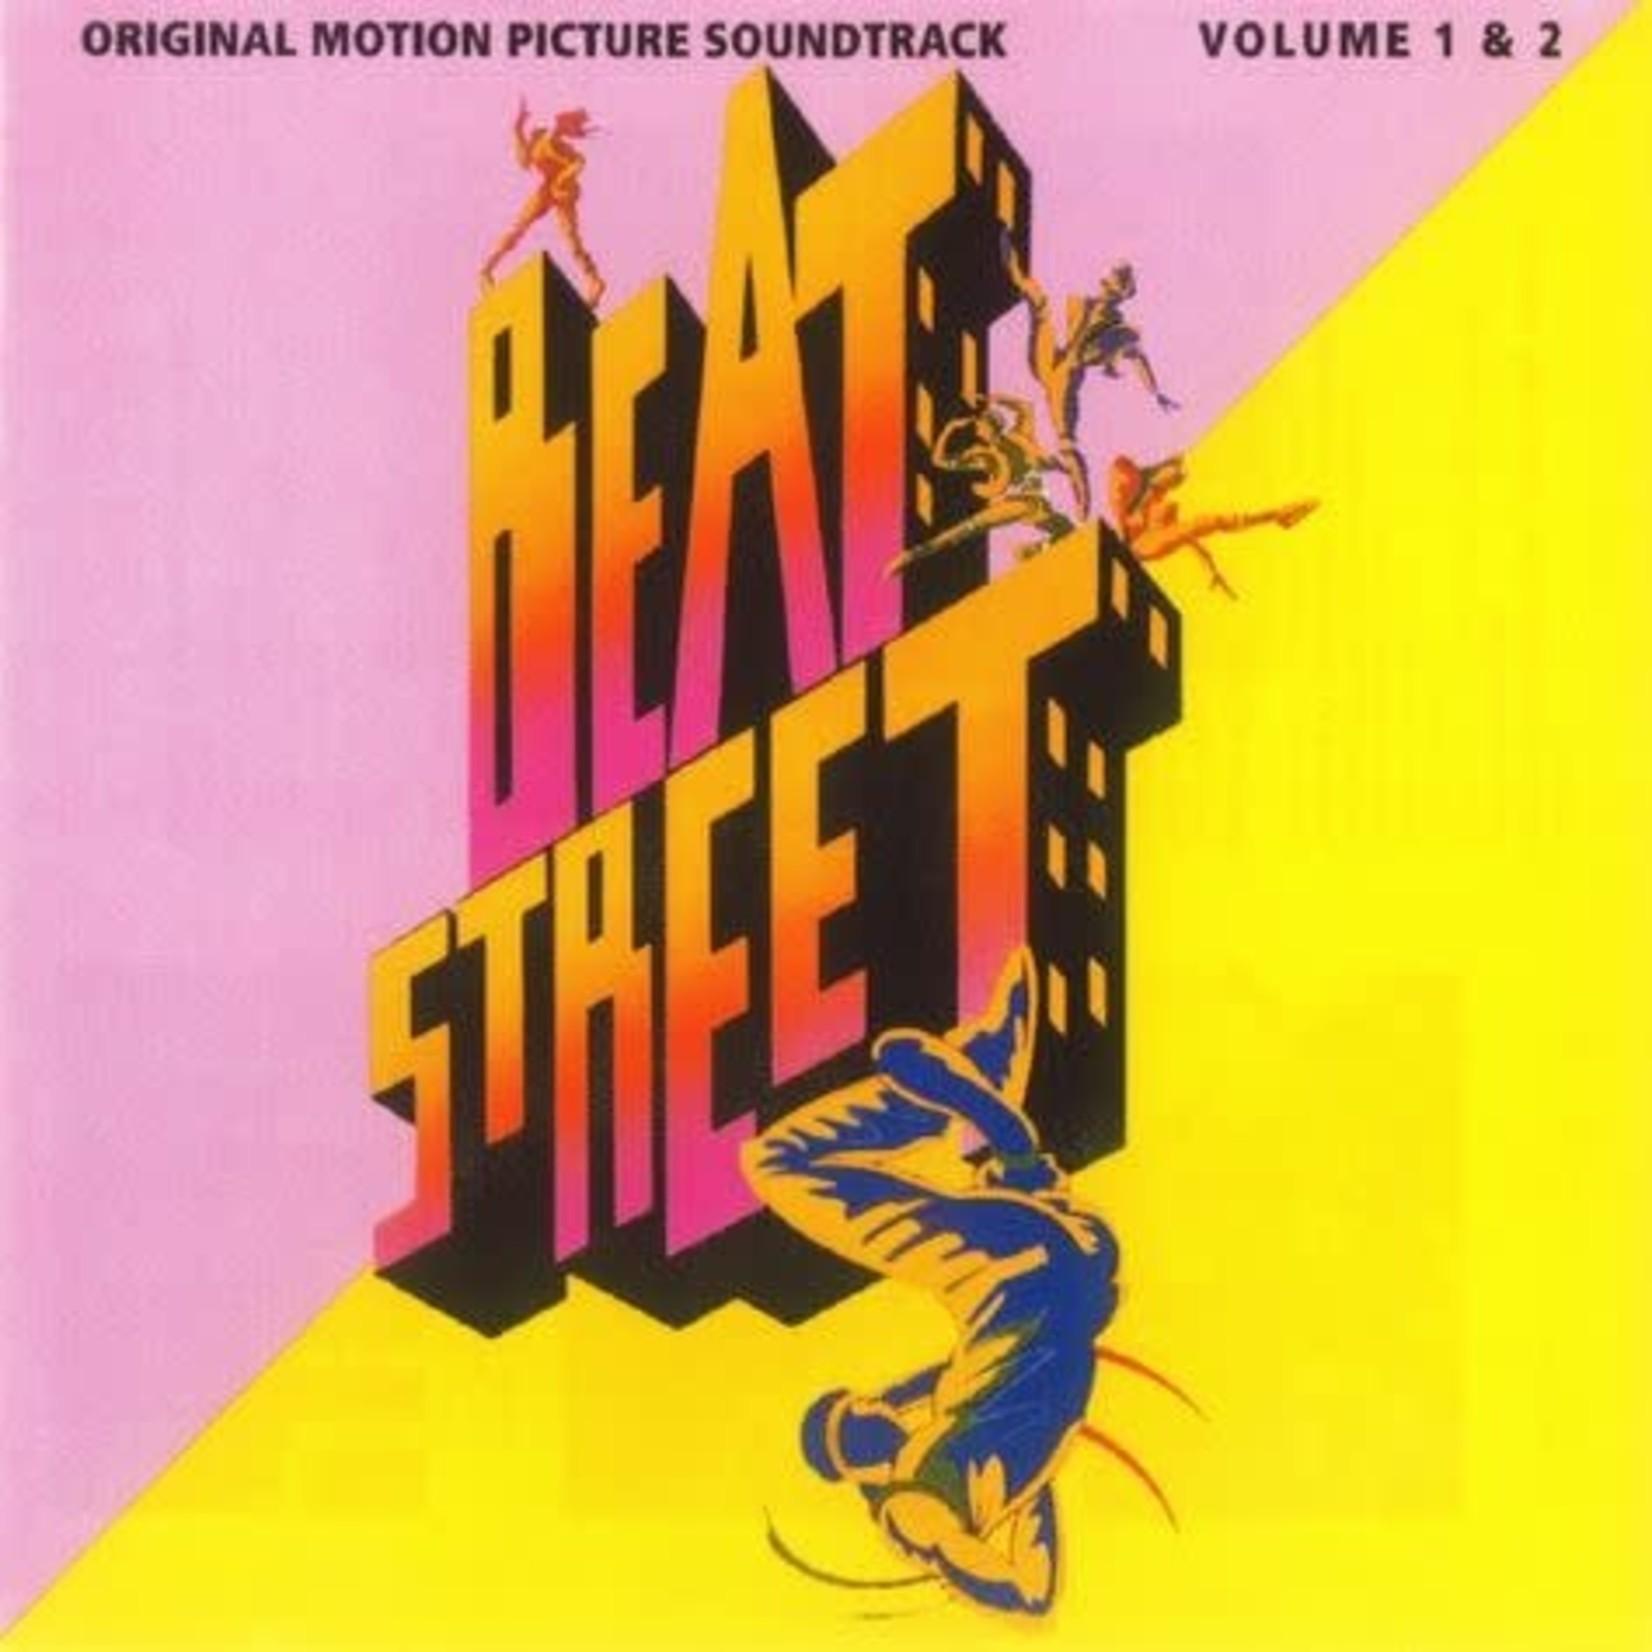 [Vintage] Various: Beat Street Vol. 1 (Soundtrack)